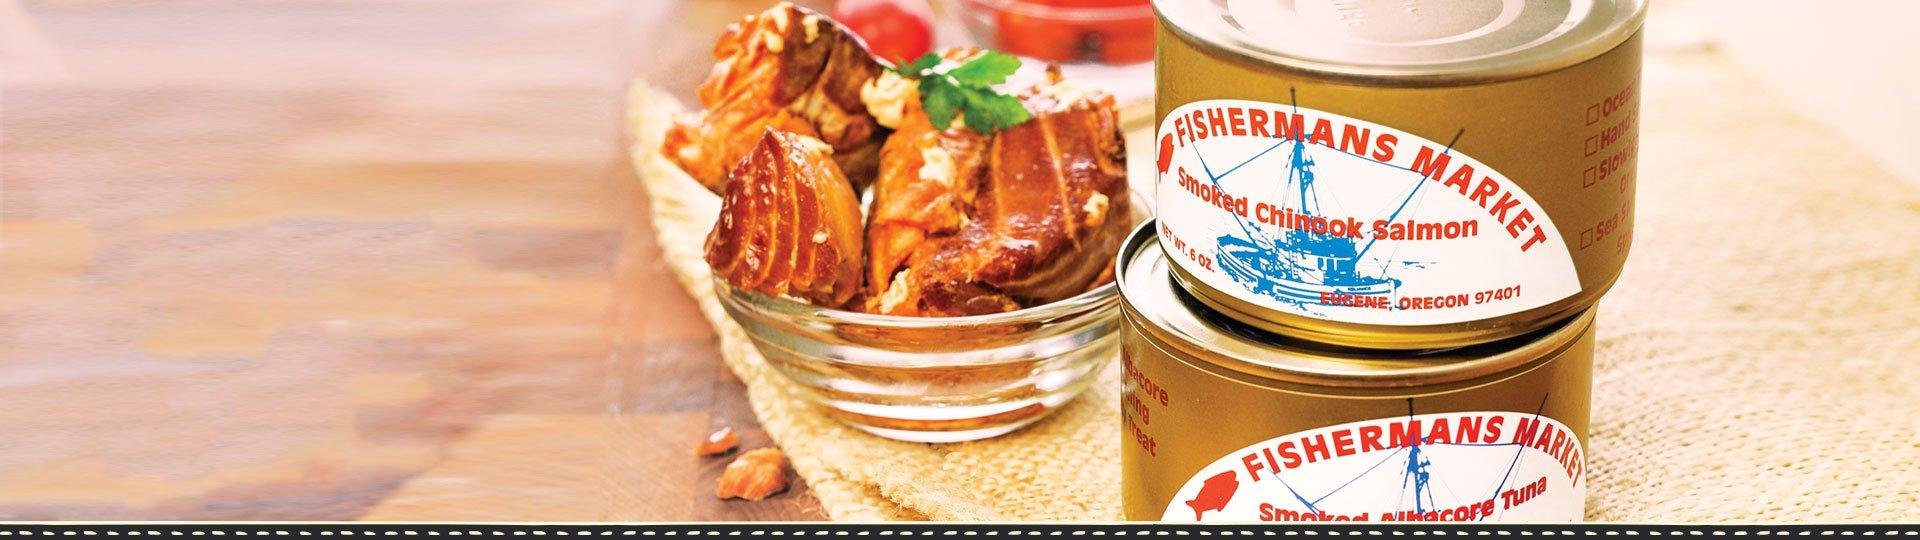 Fisherman's Market Canned Smoked Chinook Salmon and Smoked Albacore Tuna